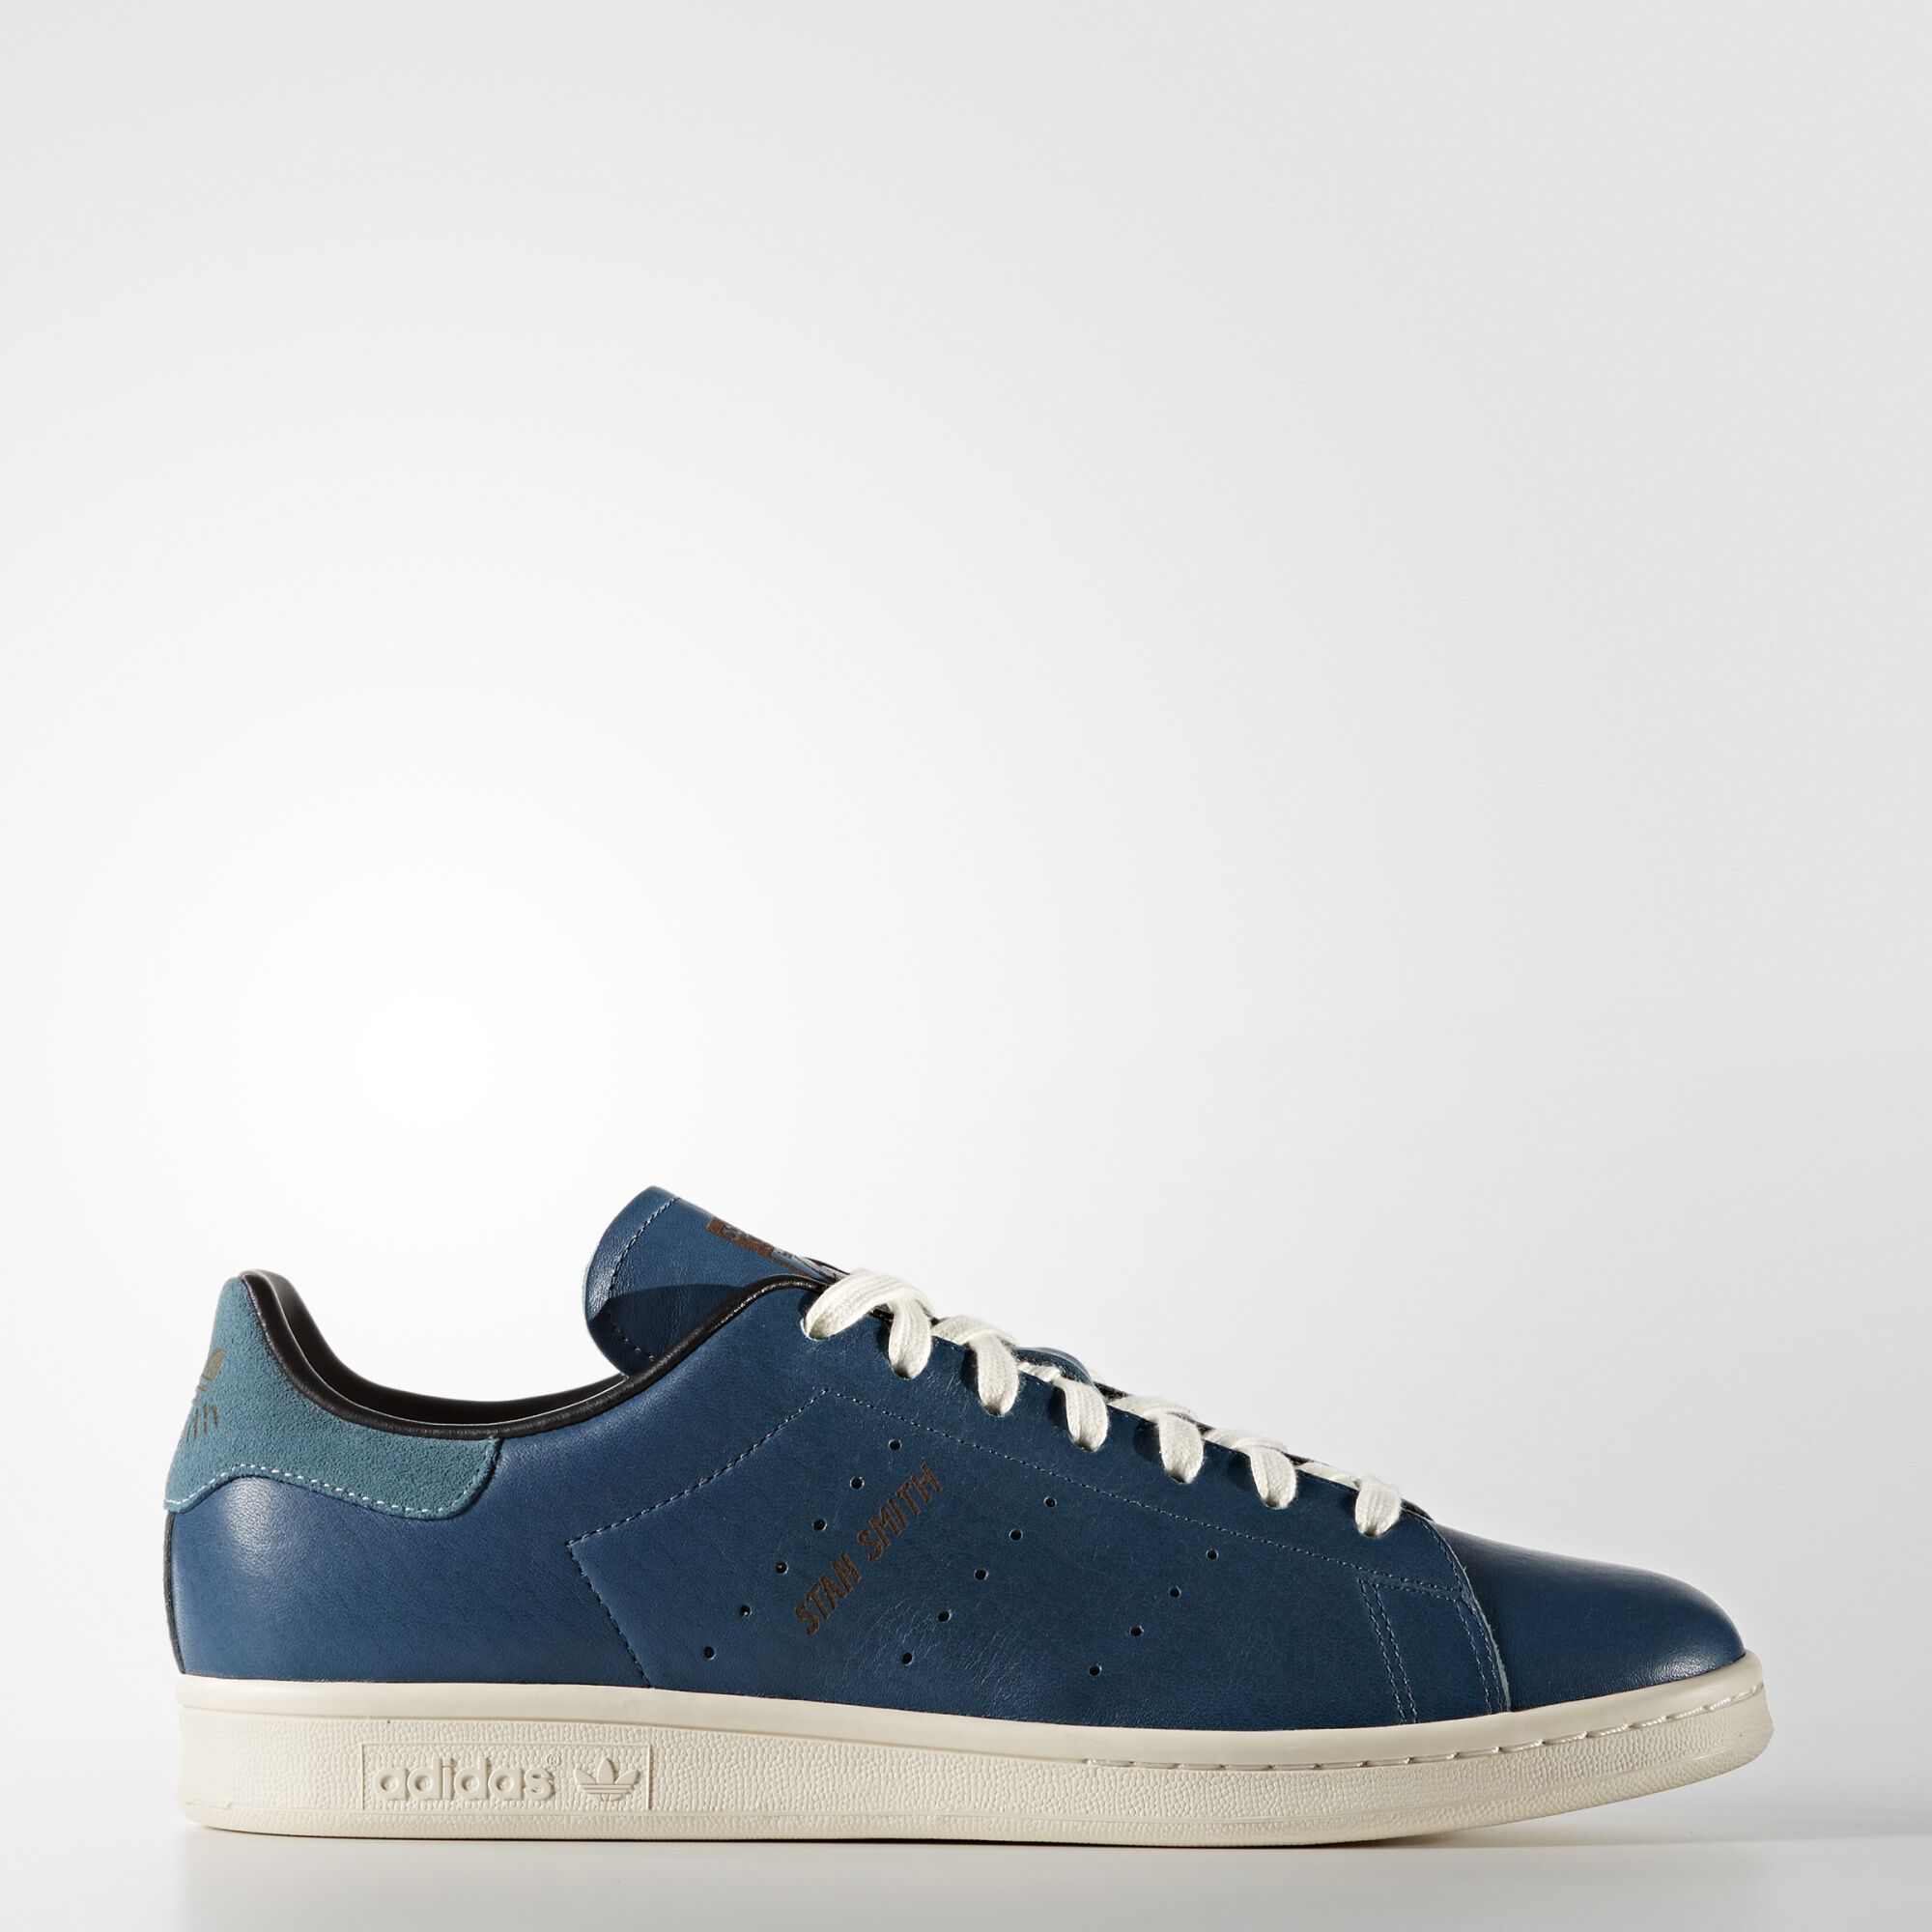 adidas stan smith og bleu